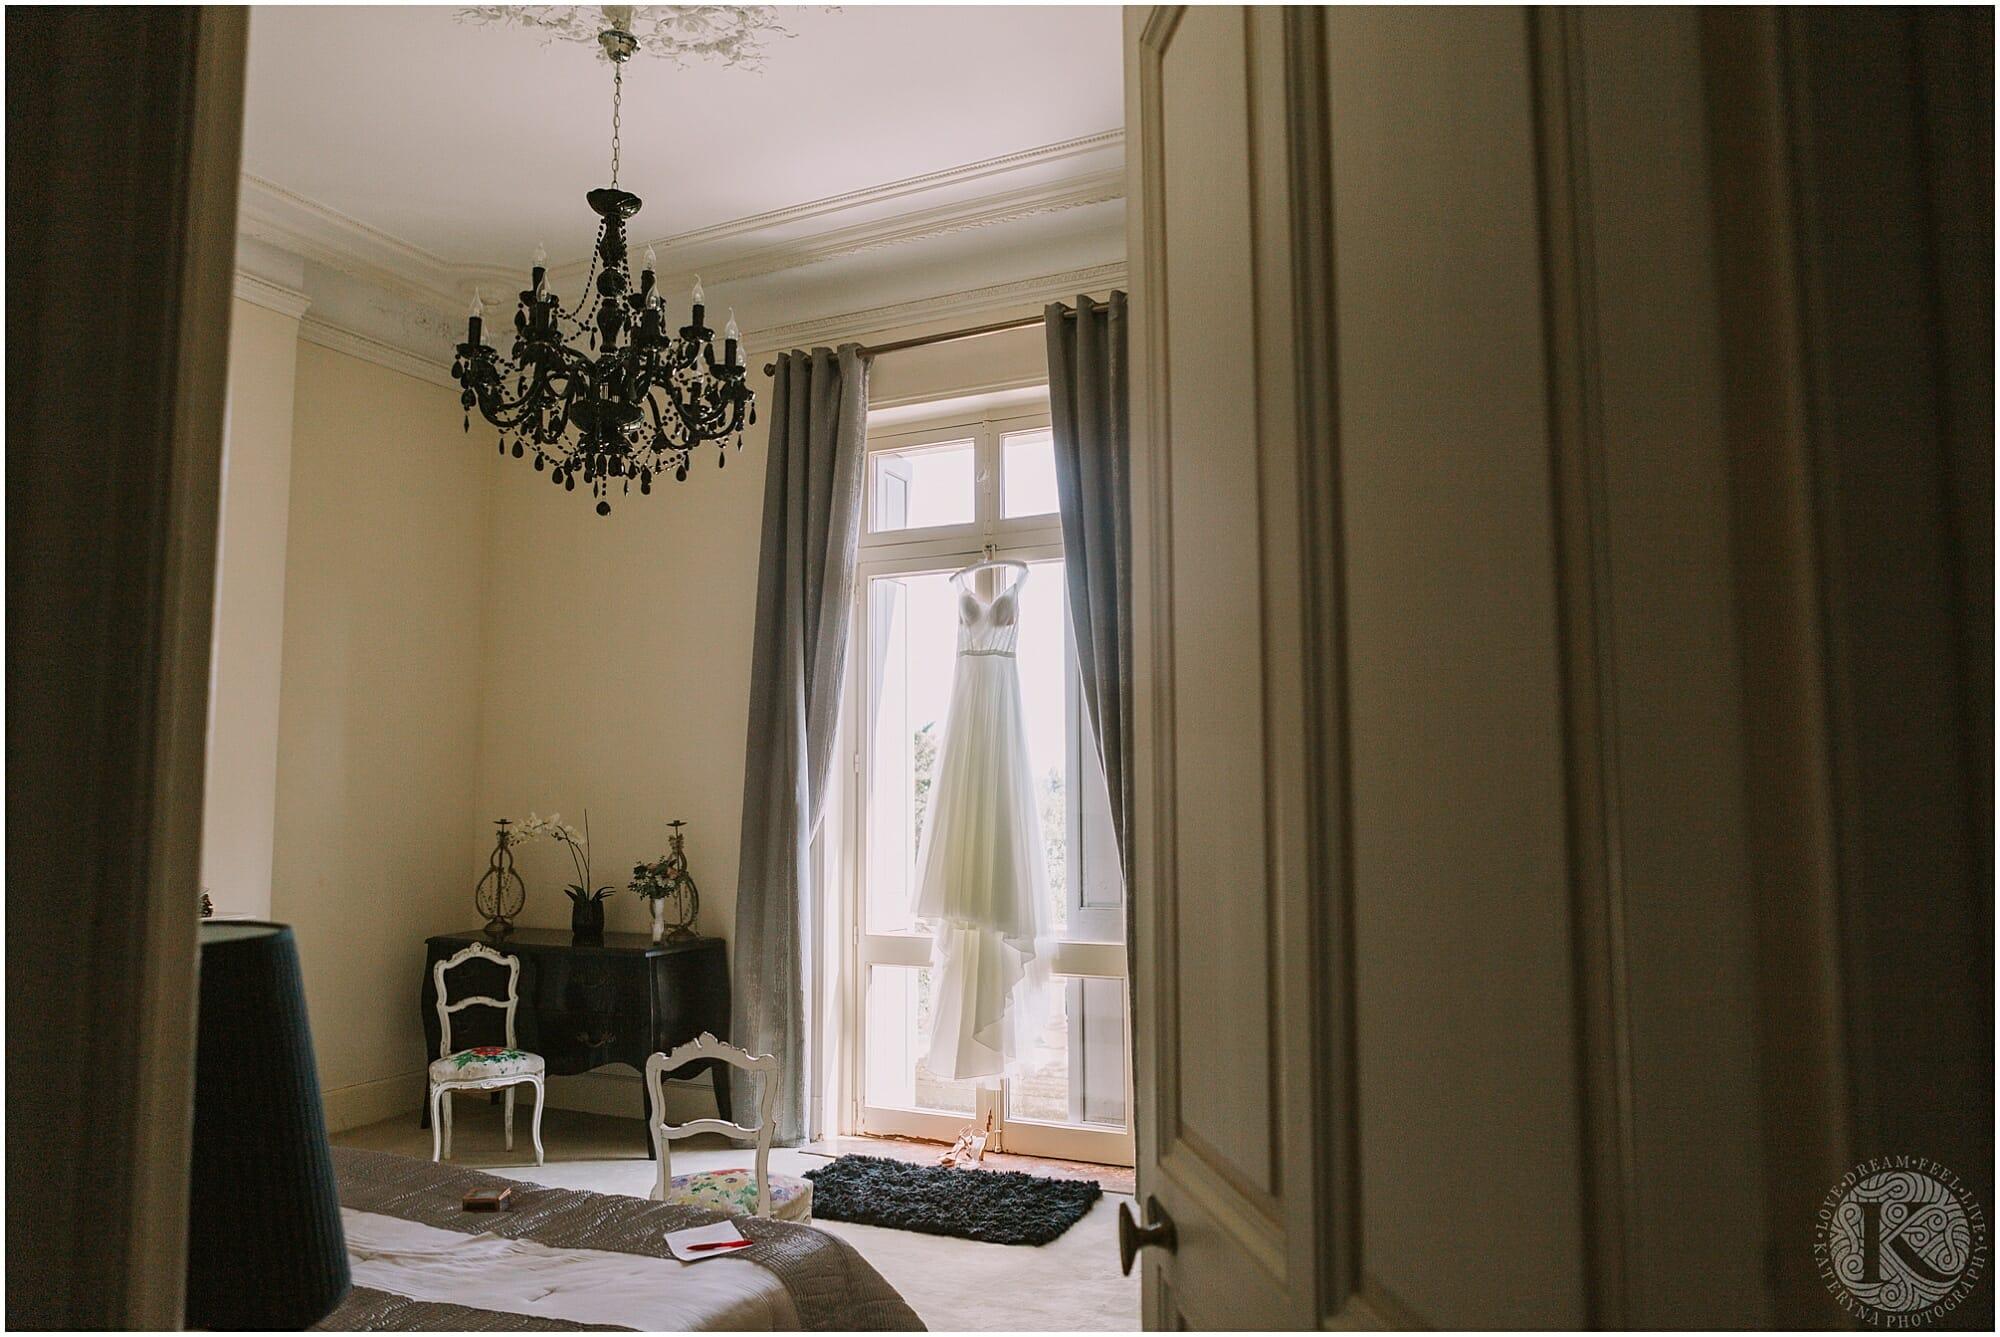 Kateryna-photos-photographe-mariage-chateau-des-3-fontaines-provence-avignon-vaucluse-sud_0019.jpg